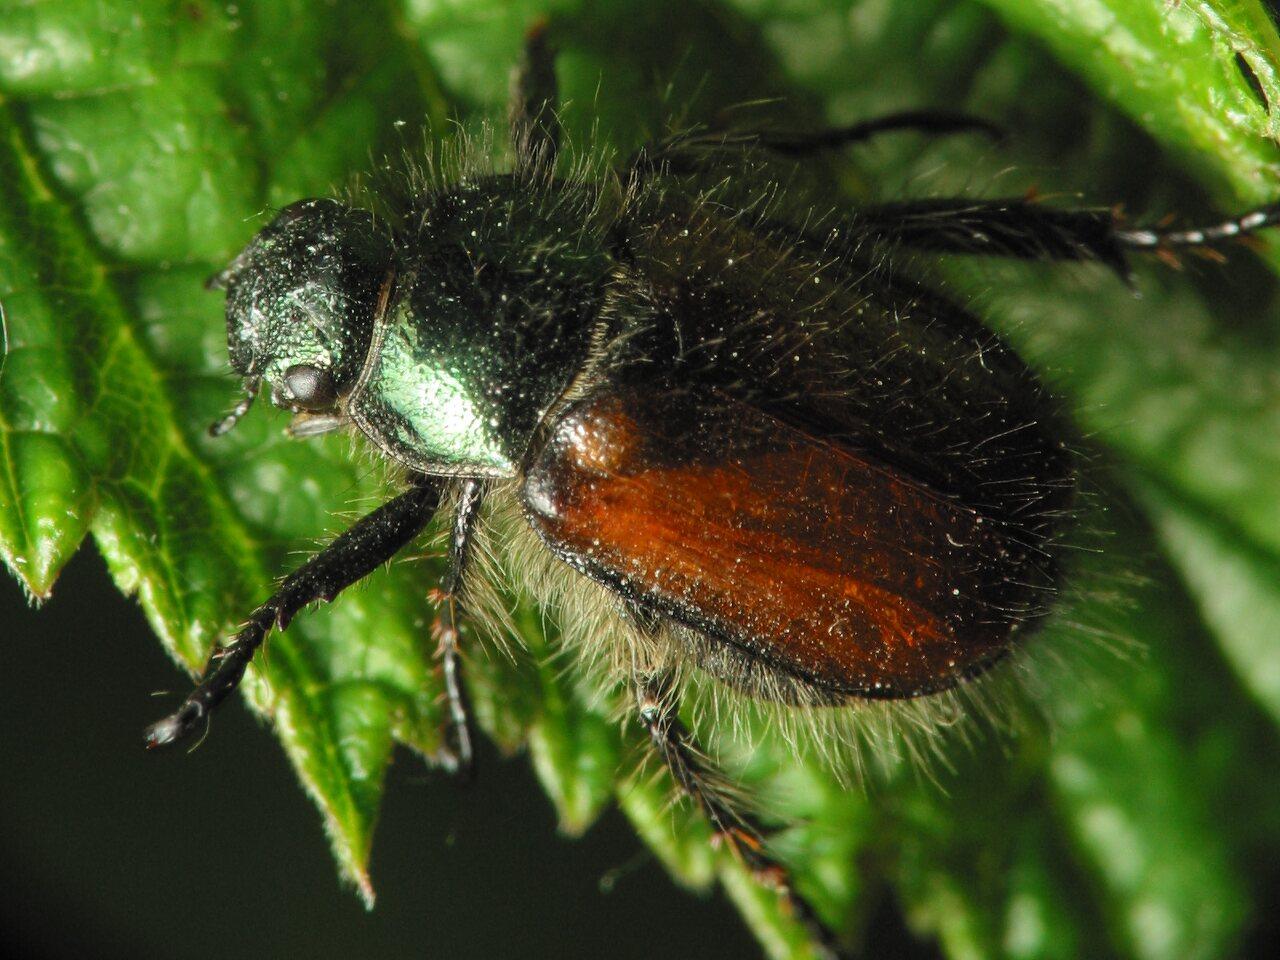 Phyllopertha-horticola-2355.jpg